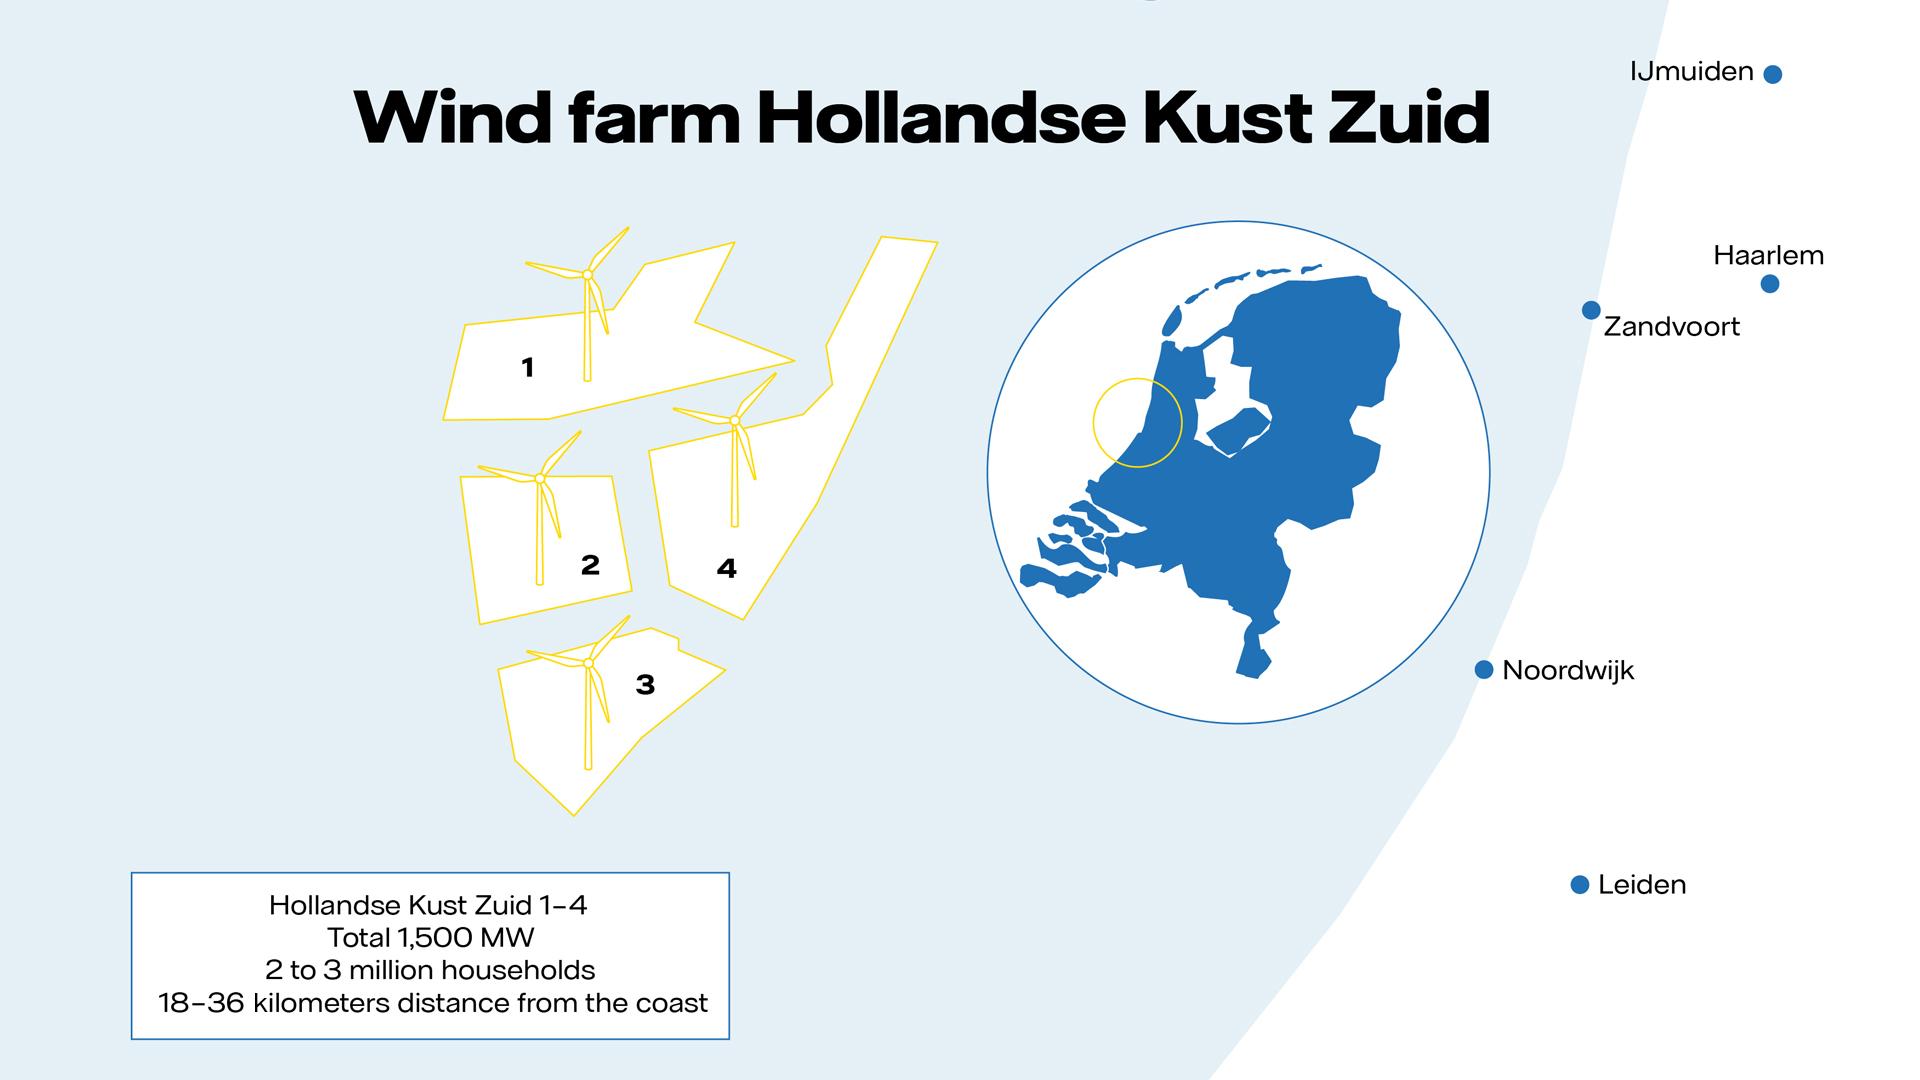 map-hollandse-kust-zuid_1920x1080.jpg